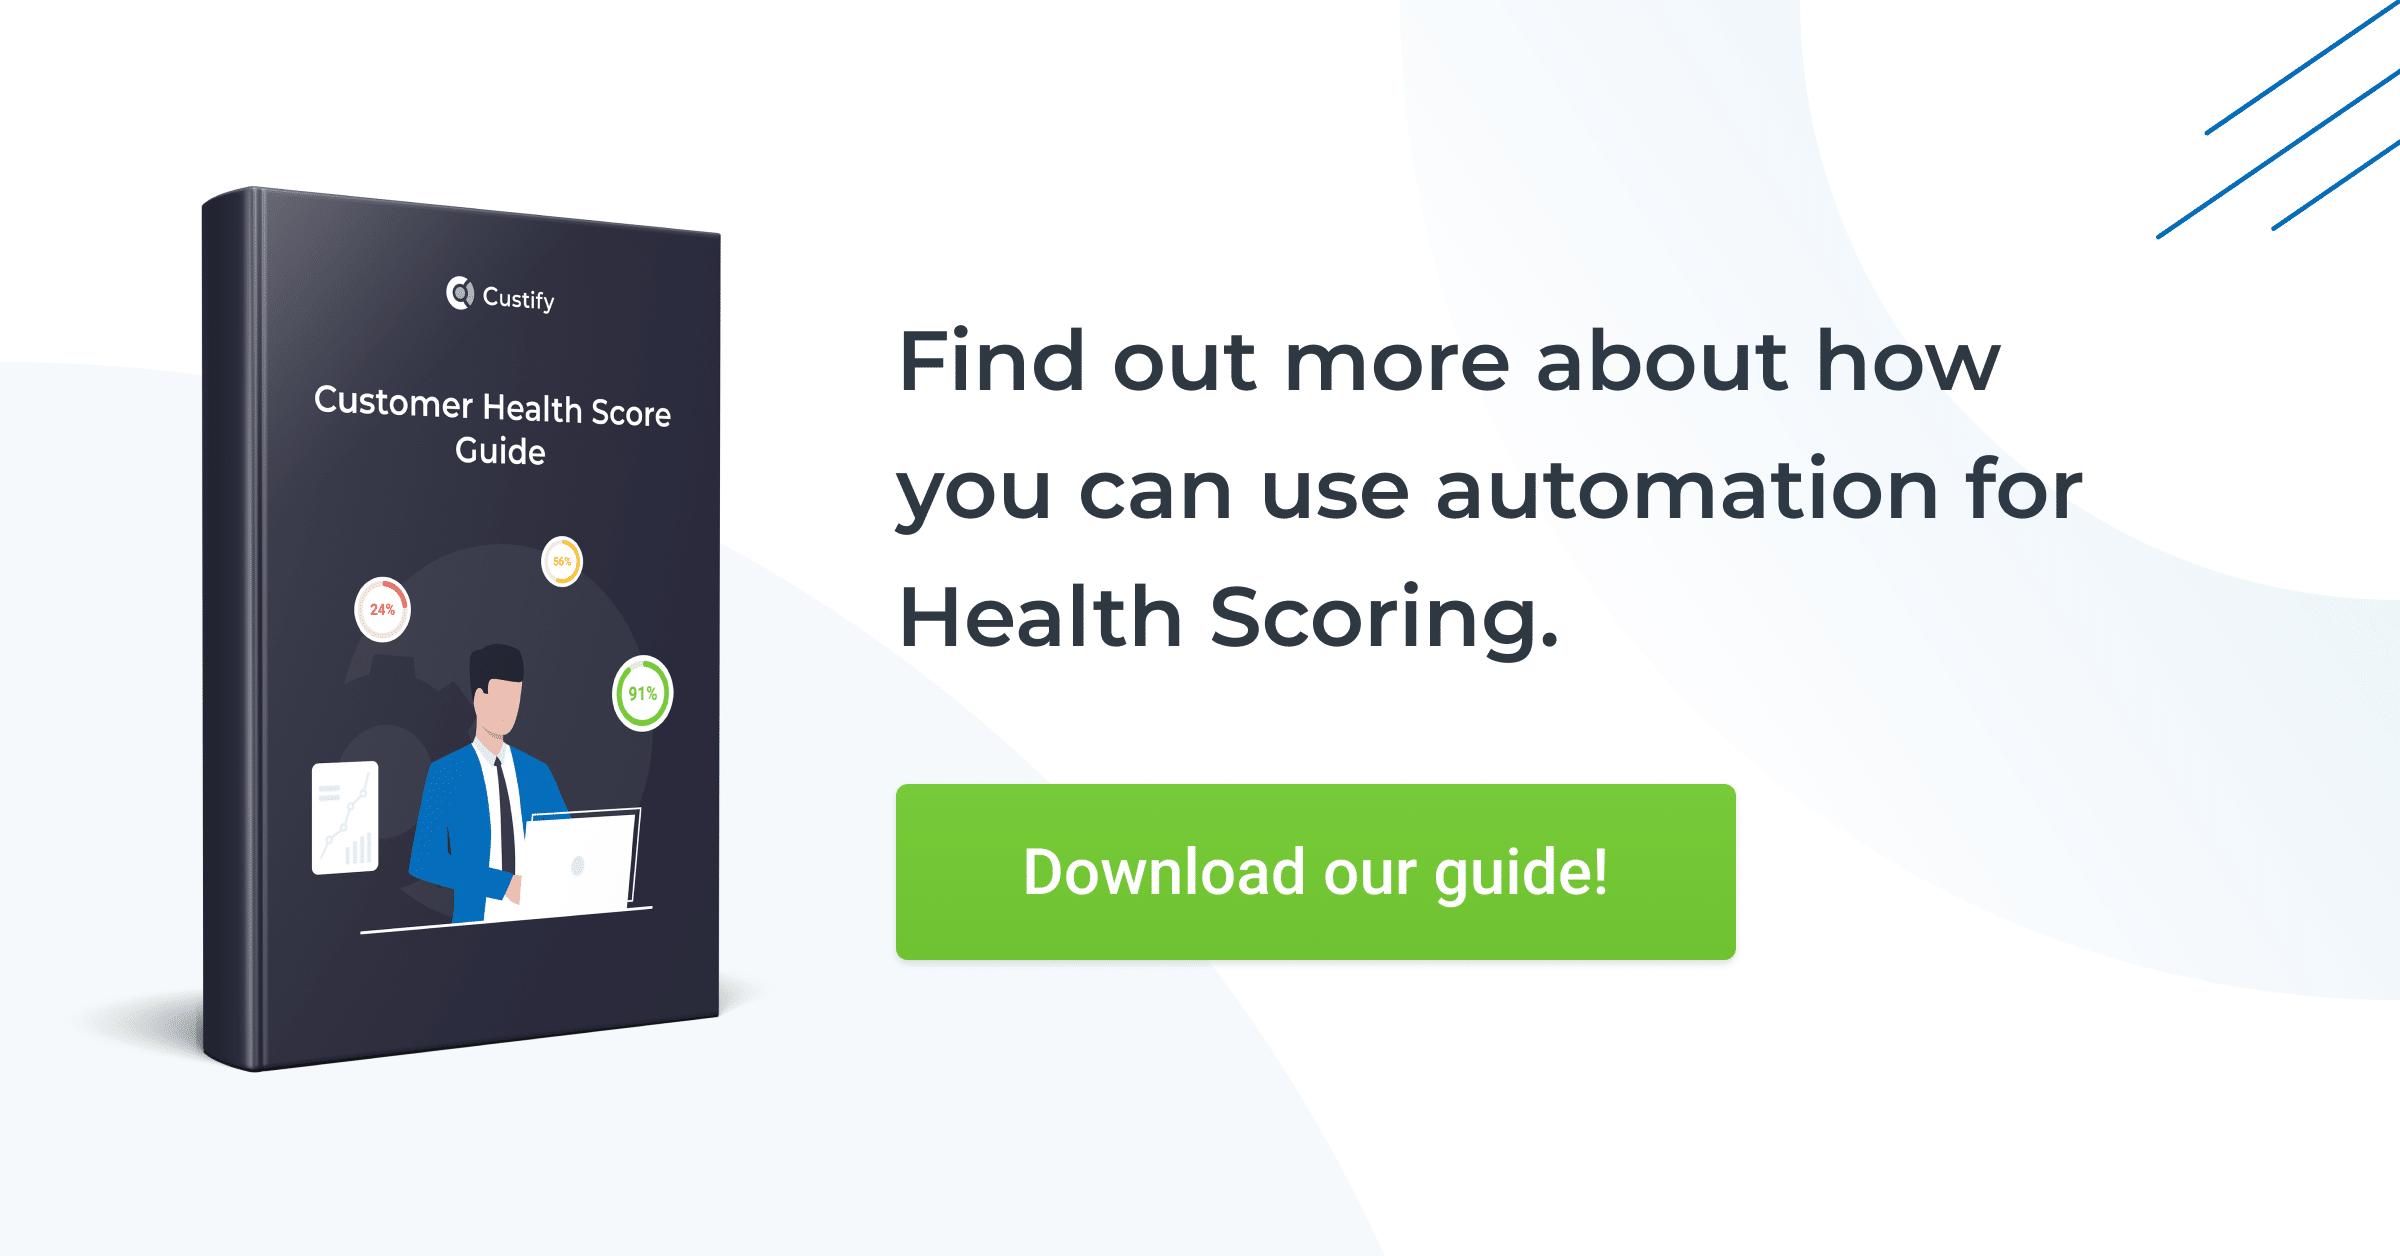 customer health score guide